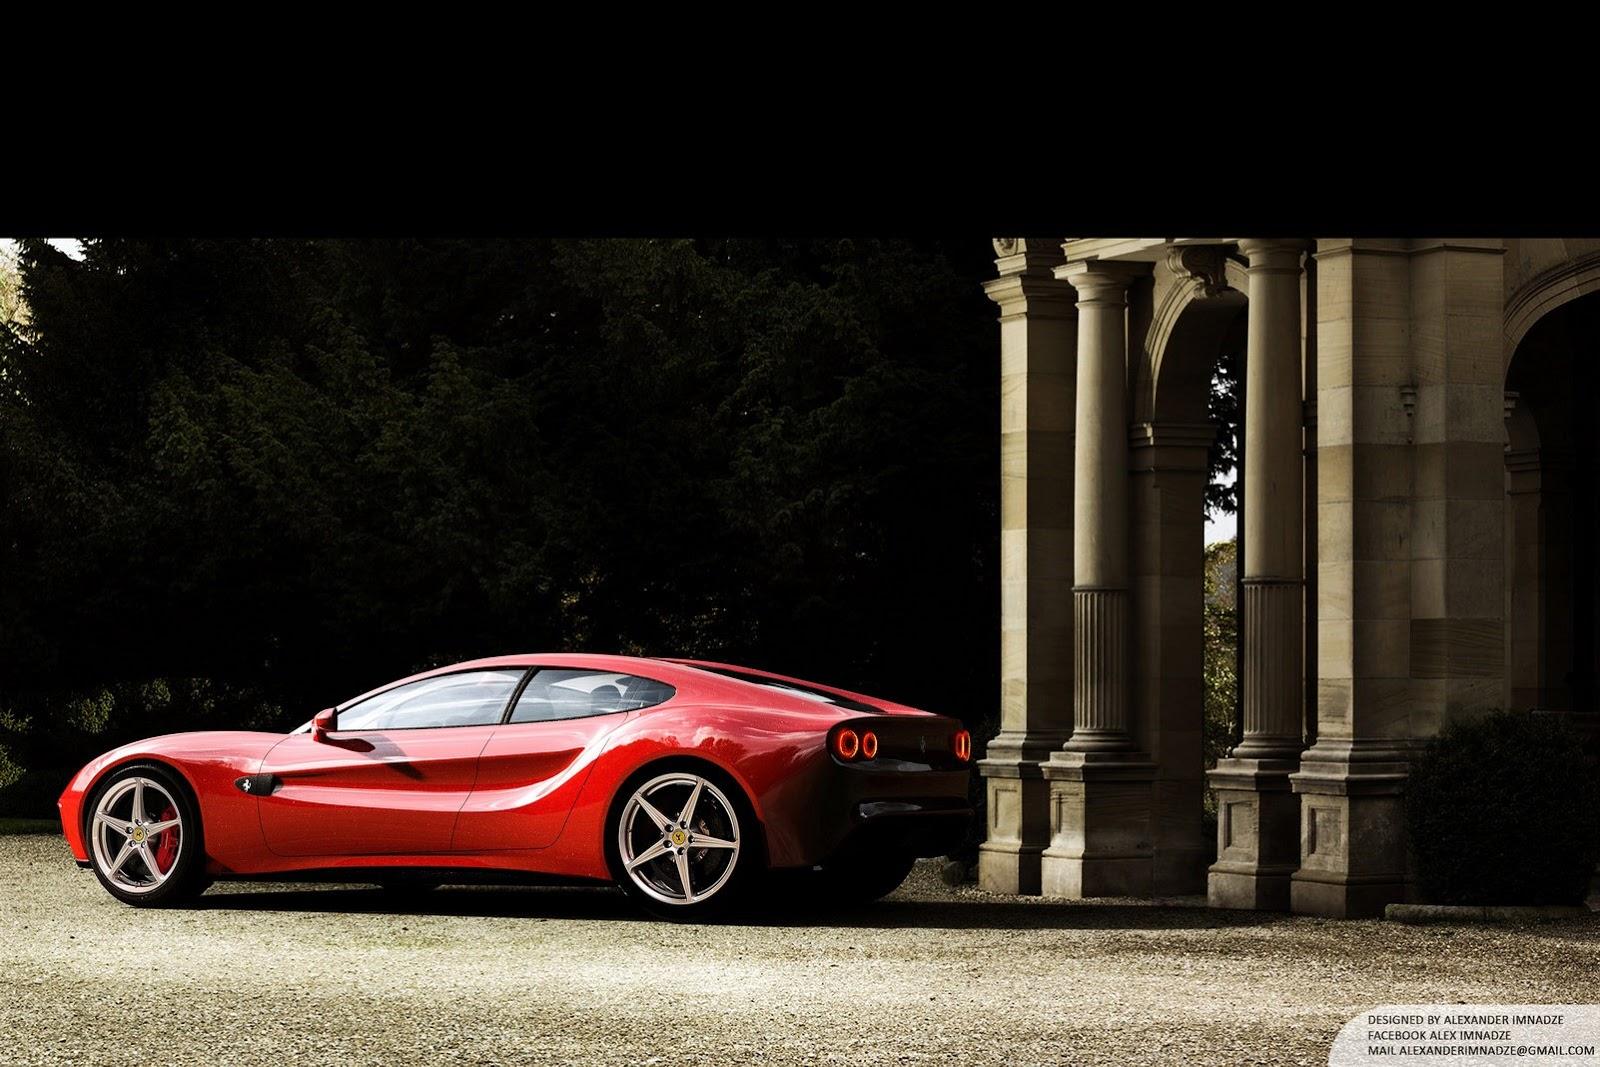 http://images.caradisiac.com/images/3/5/1/9/83519/S0-Une-proposition-de-Ferrari-Quattroporte-281554.jpg